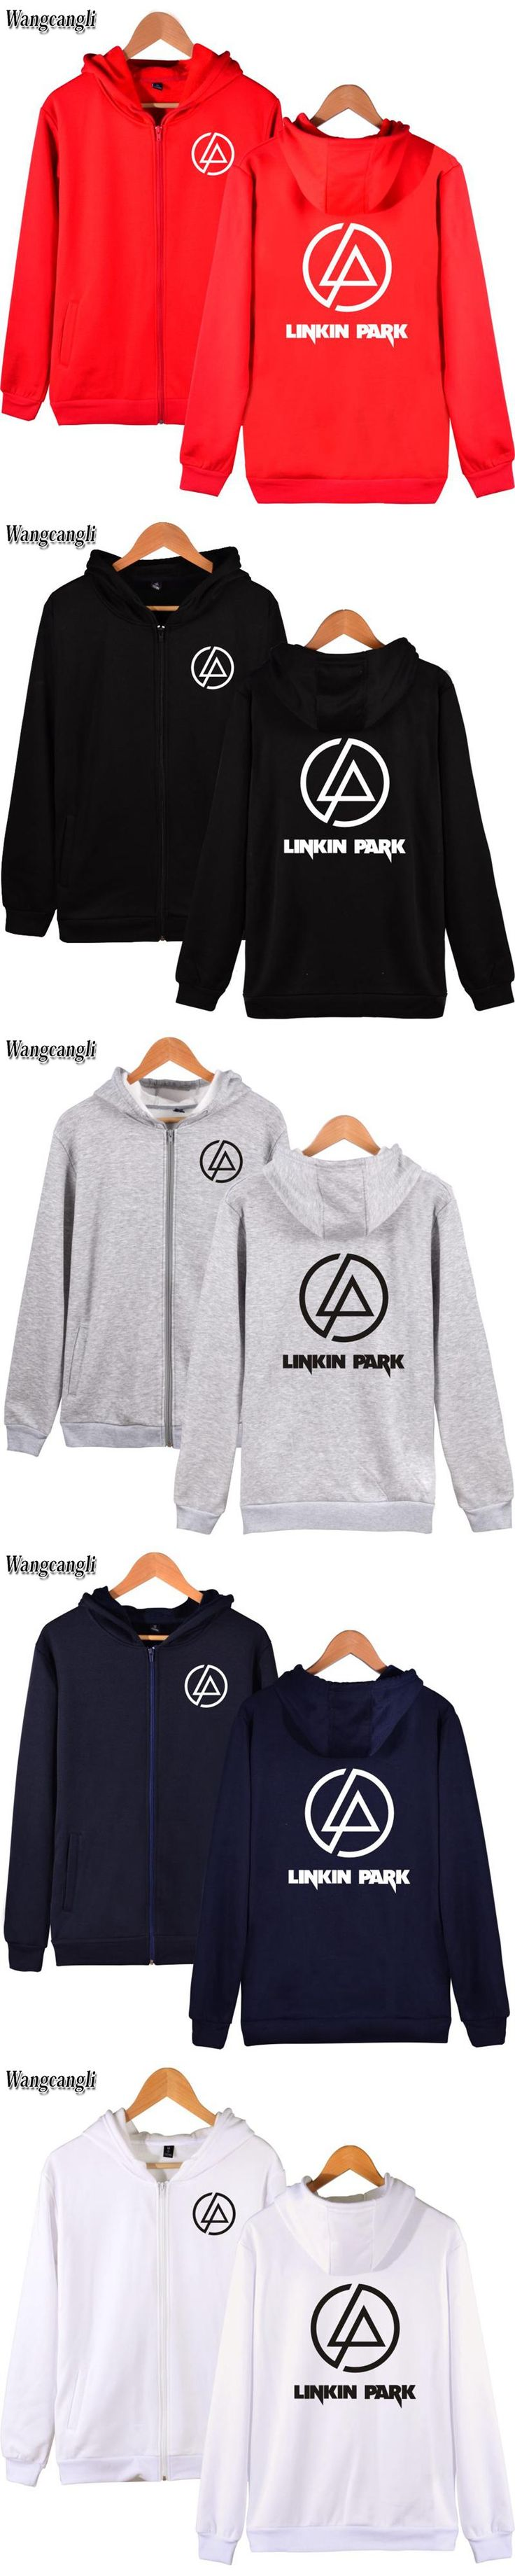 2017 new Linkin Park printing cotton men's street fashion zipper hoodie men's / women's zipper rock band print fashion hooded